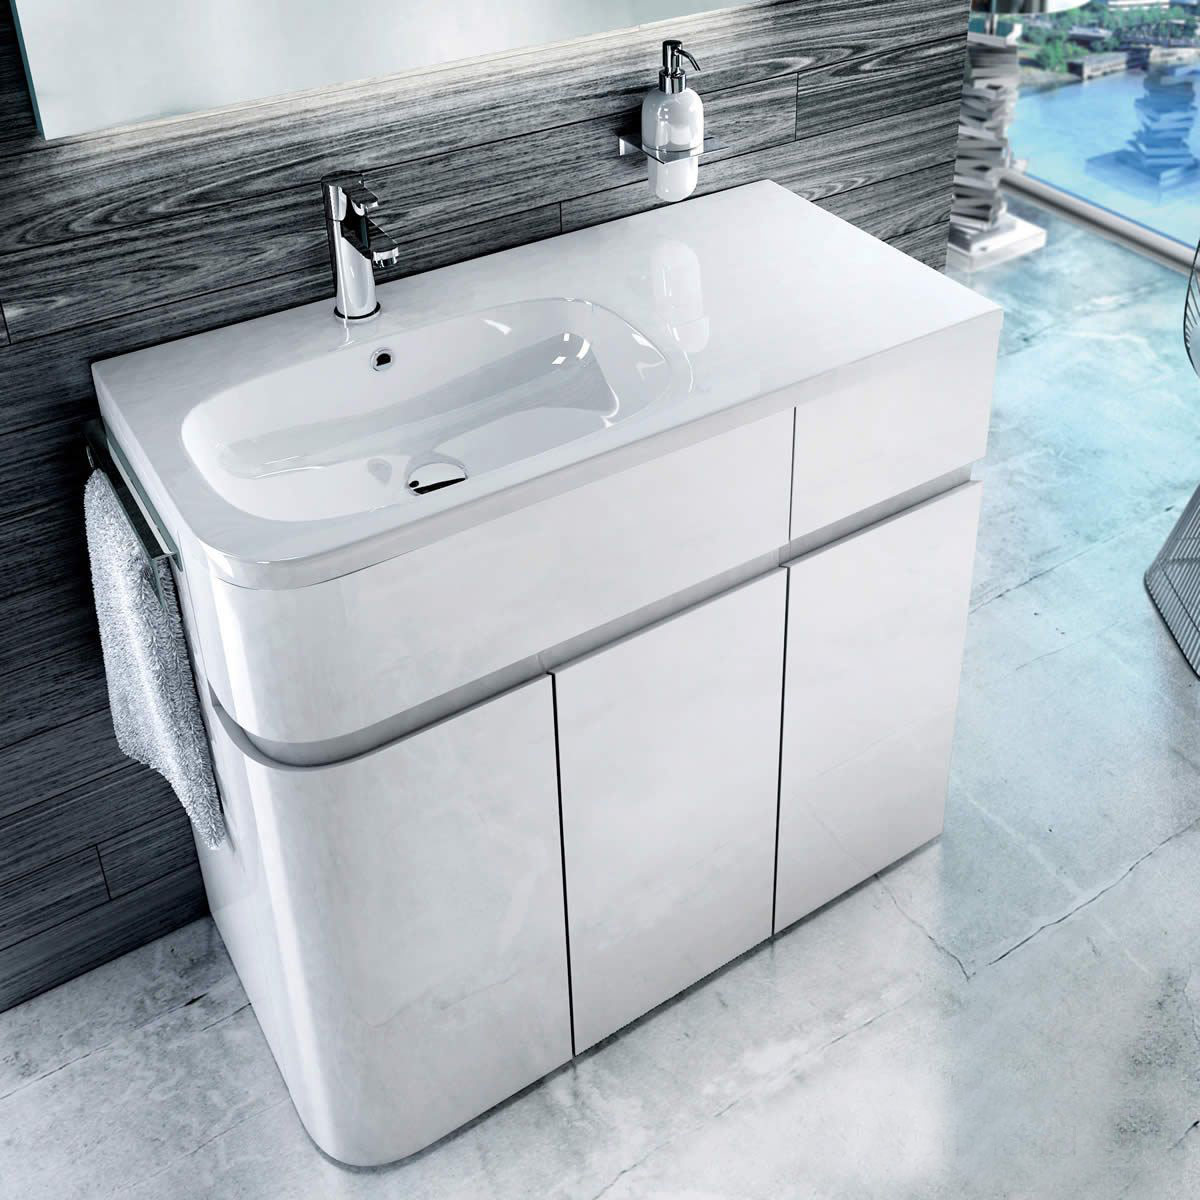 Aquacabinets vanity unit